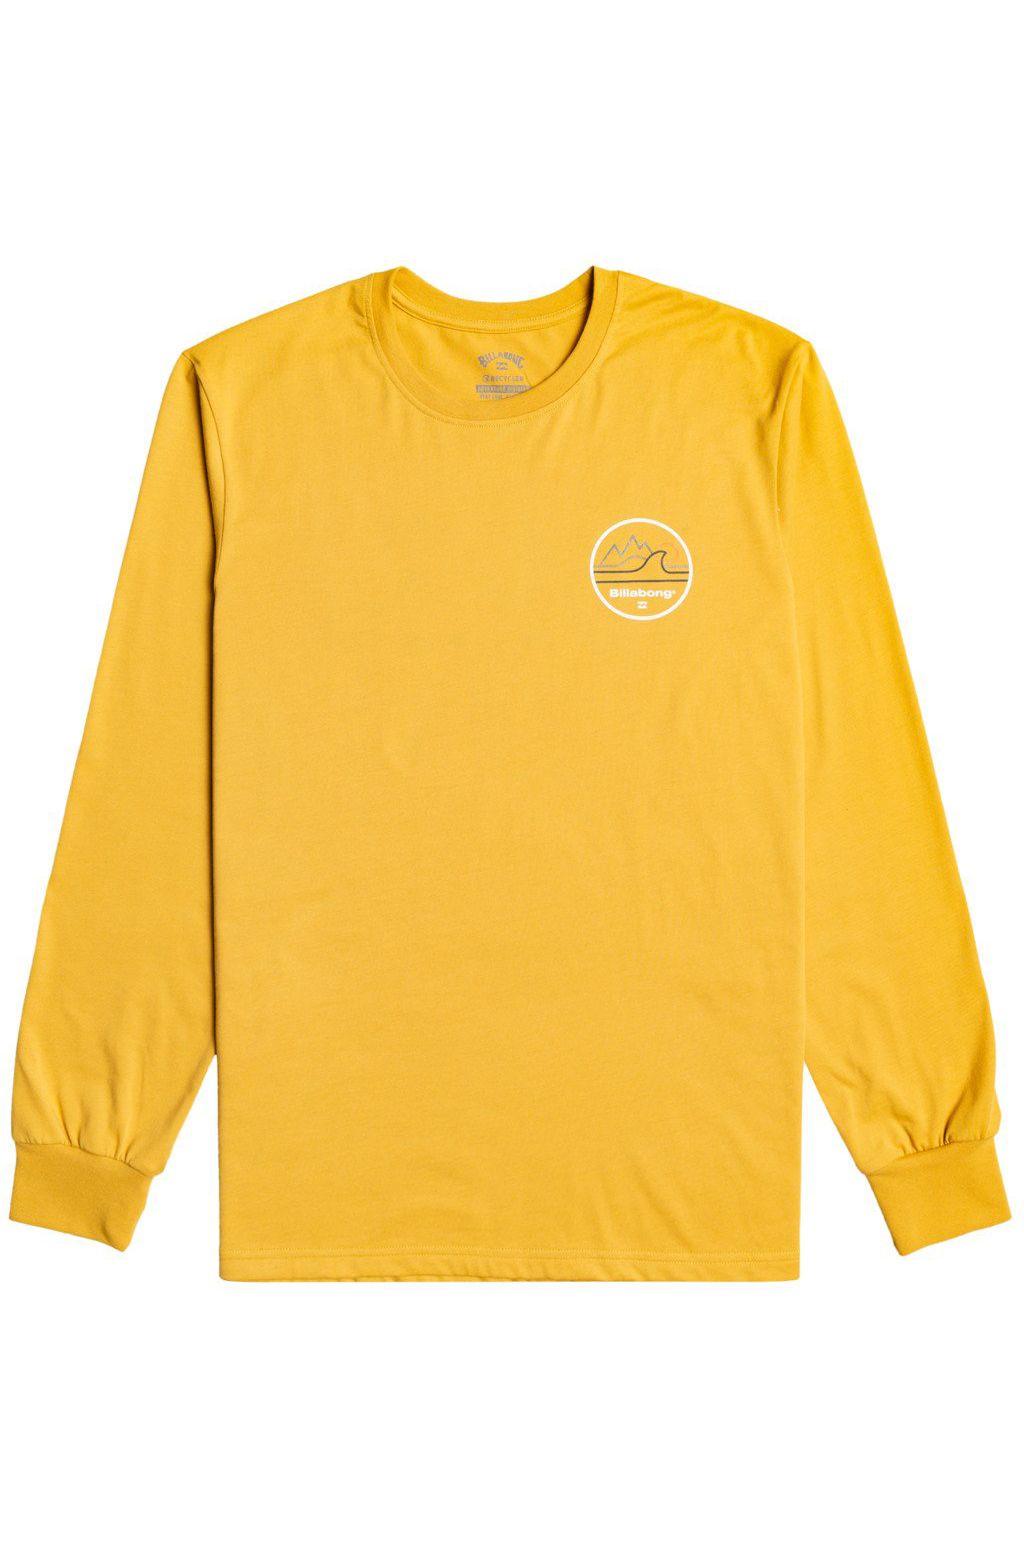 Billabong L-Sleeve PEAK WAVE LS ADVENTURE DIVISION Gold